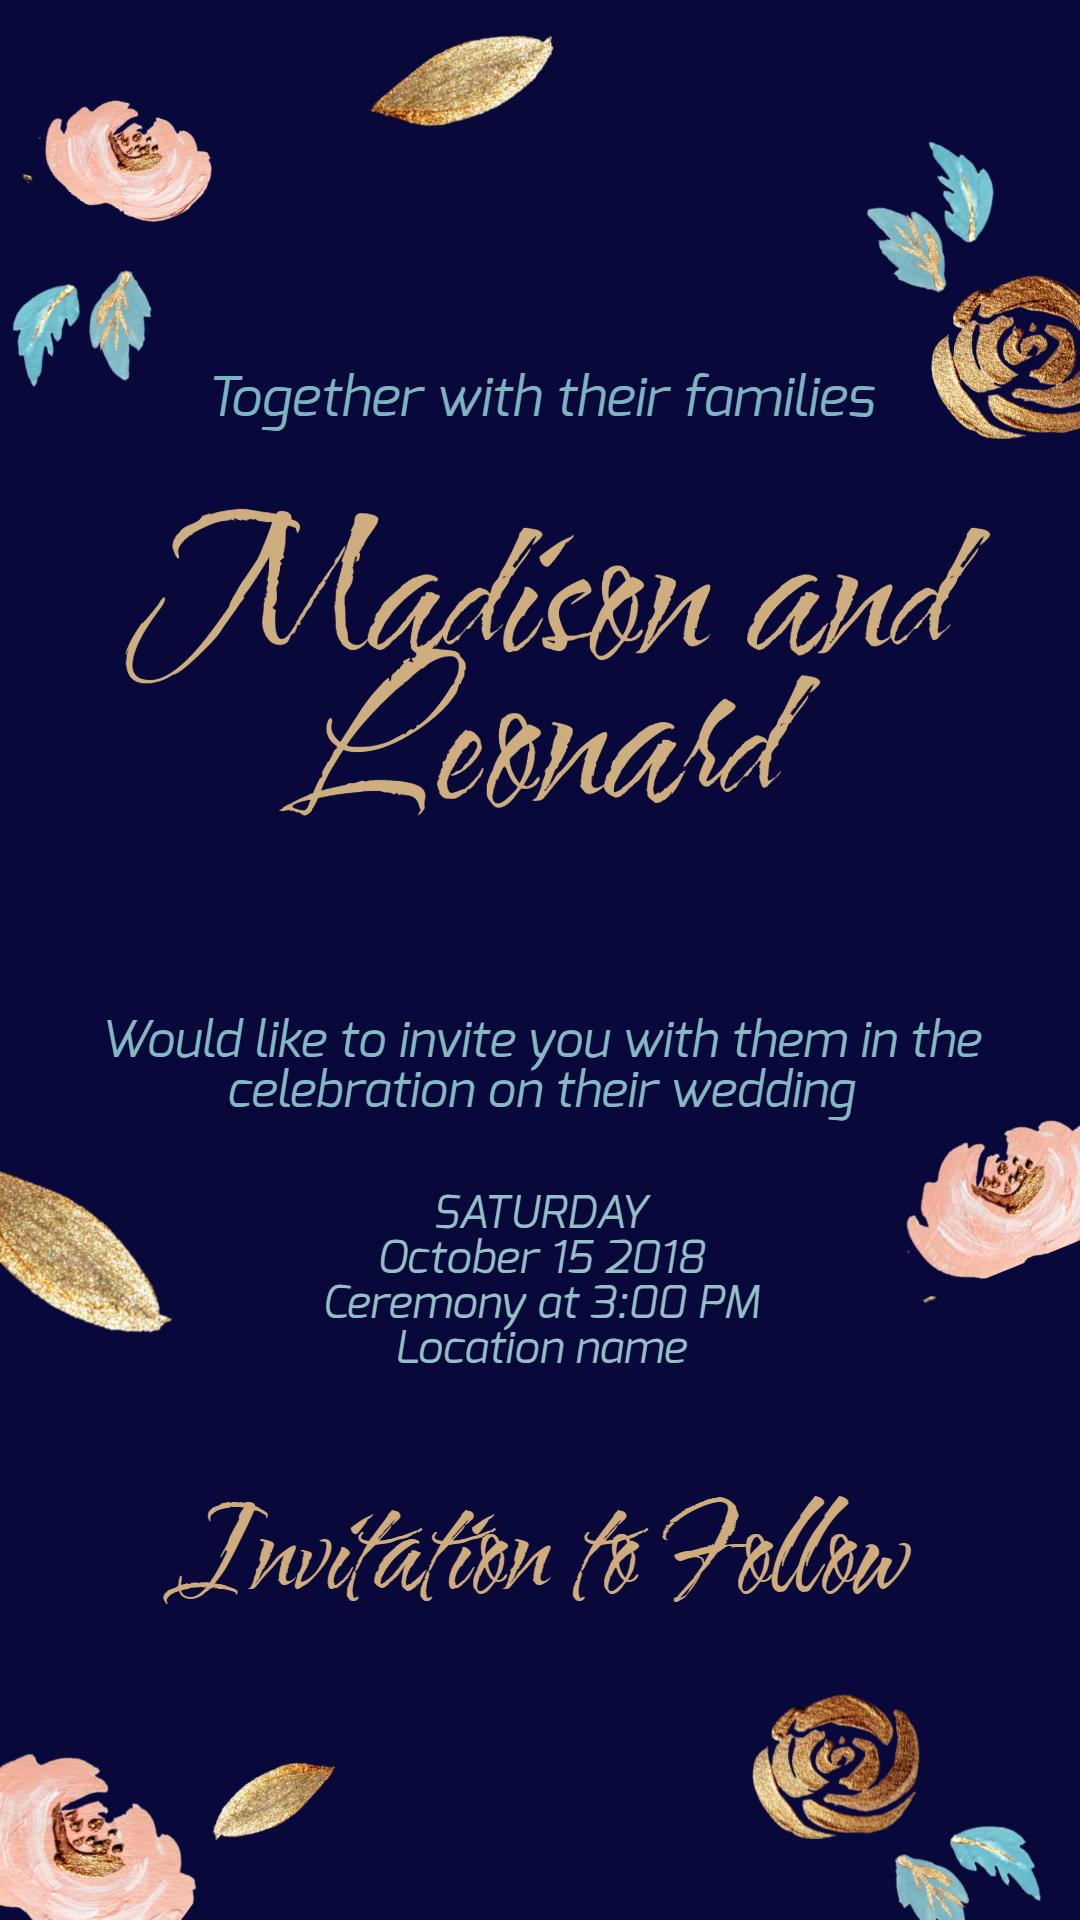 Wedding invitation #invitation Animation  Template